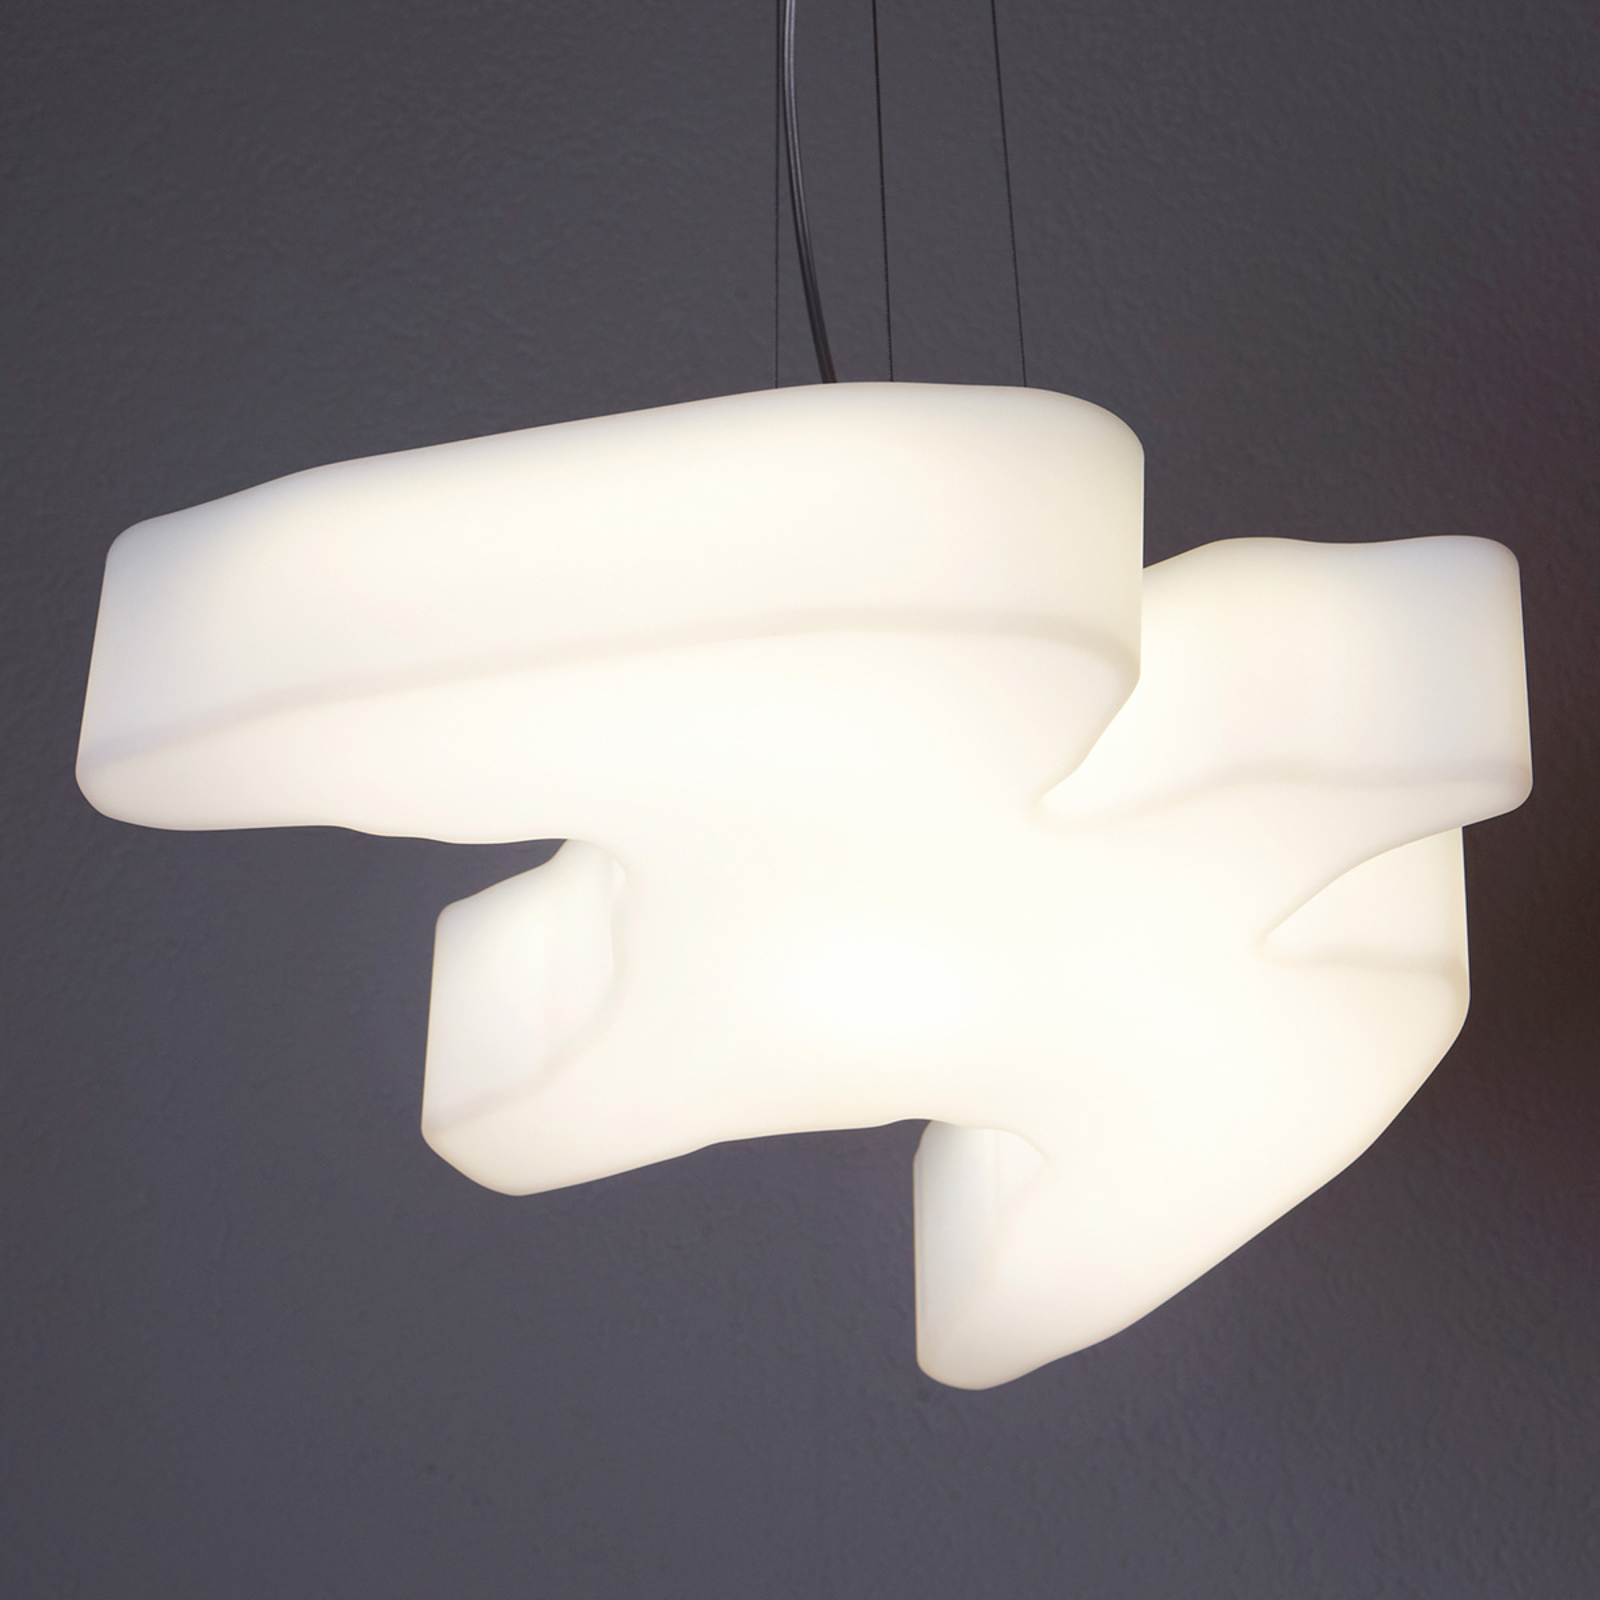 Lampada LED a sospensione The Bird